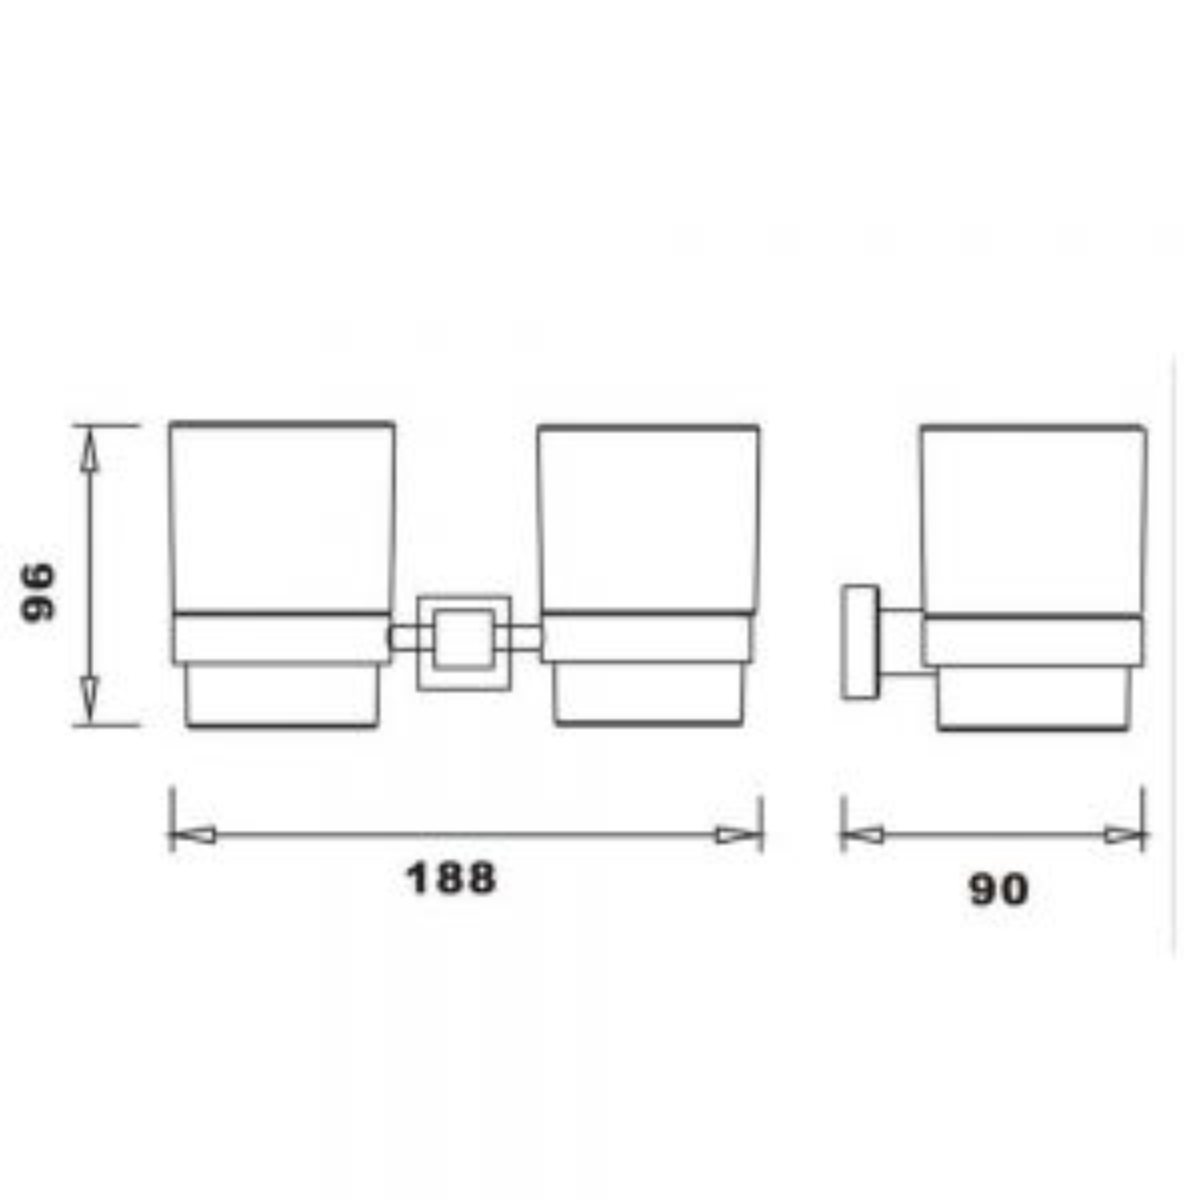 RAK Cubis Double Wall Mounted Tumbler Measurements